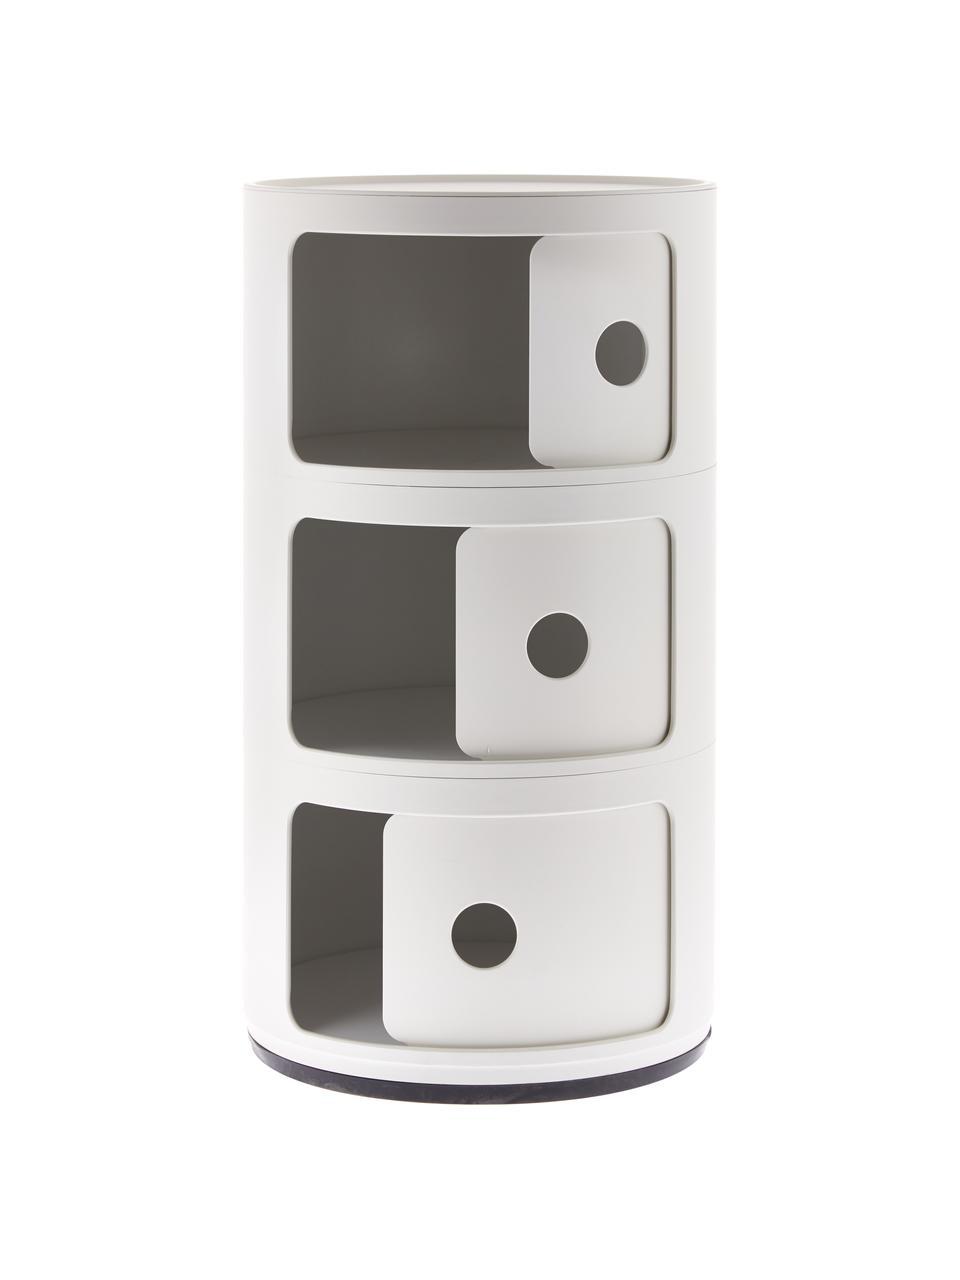 Design Container Componibili Recycled 3 Modules, Thermoplastisches Technopolymer aus recyceltem Industrieausschuss, Recycled Weiß, matt, Ø 32 x H 59 cm